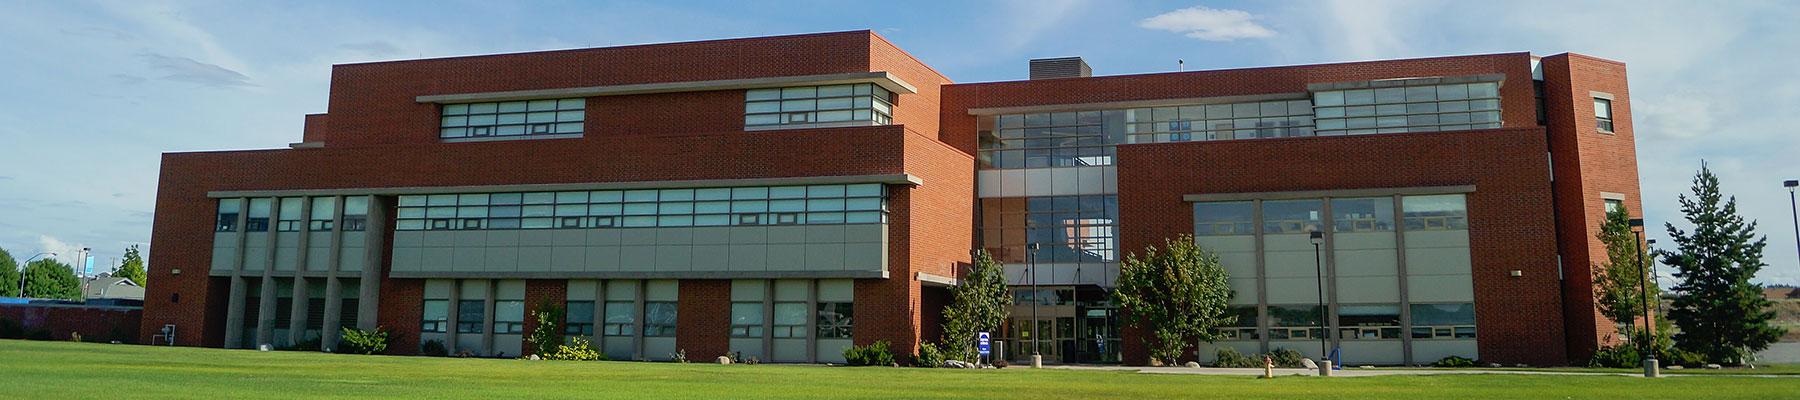 Livingston science building at SCC.